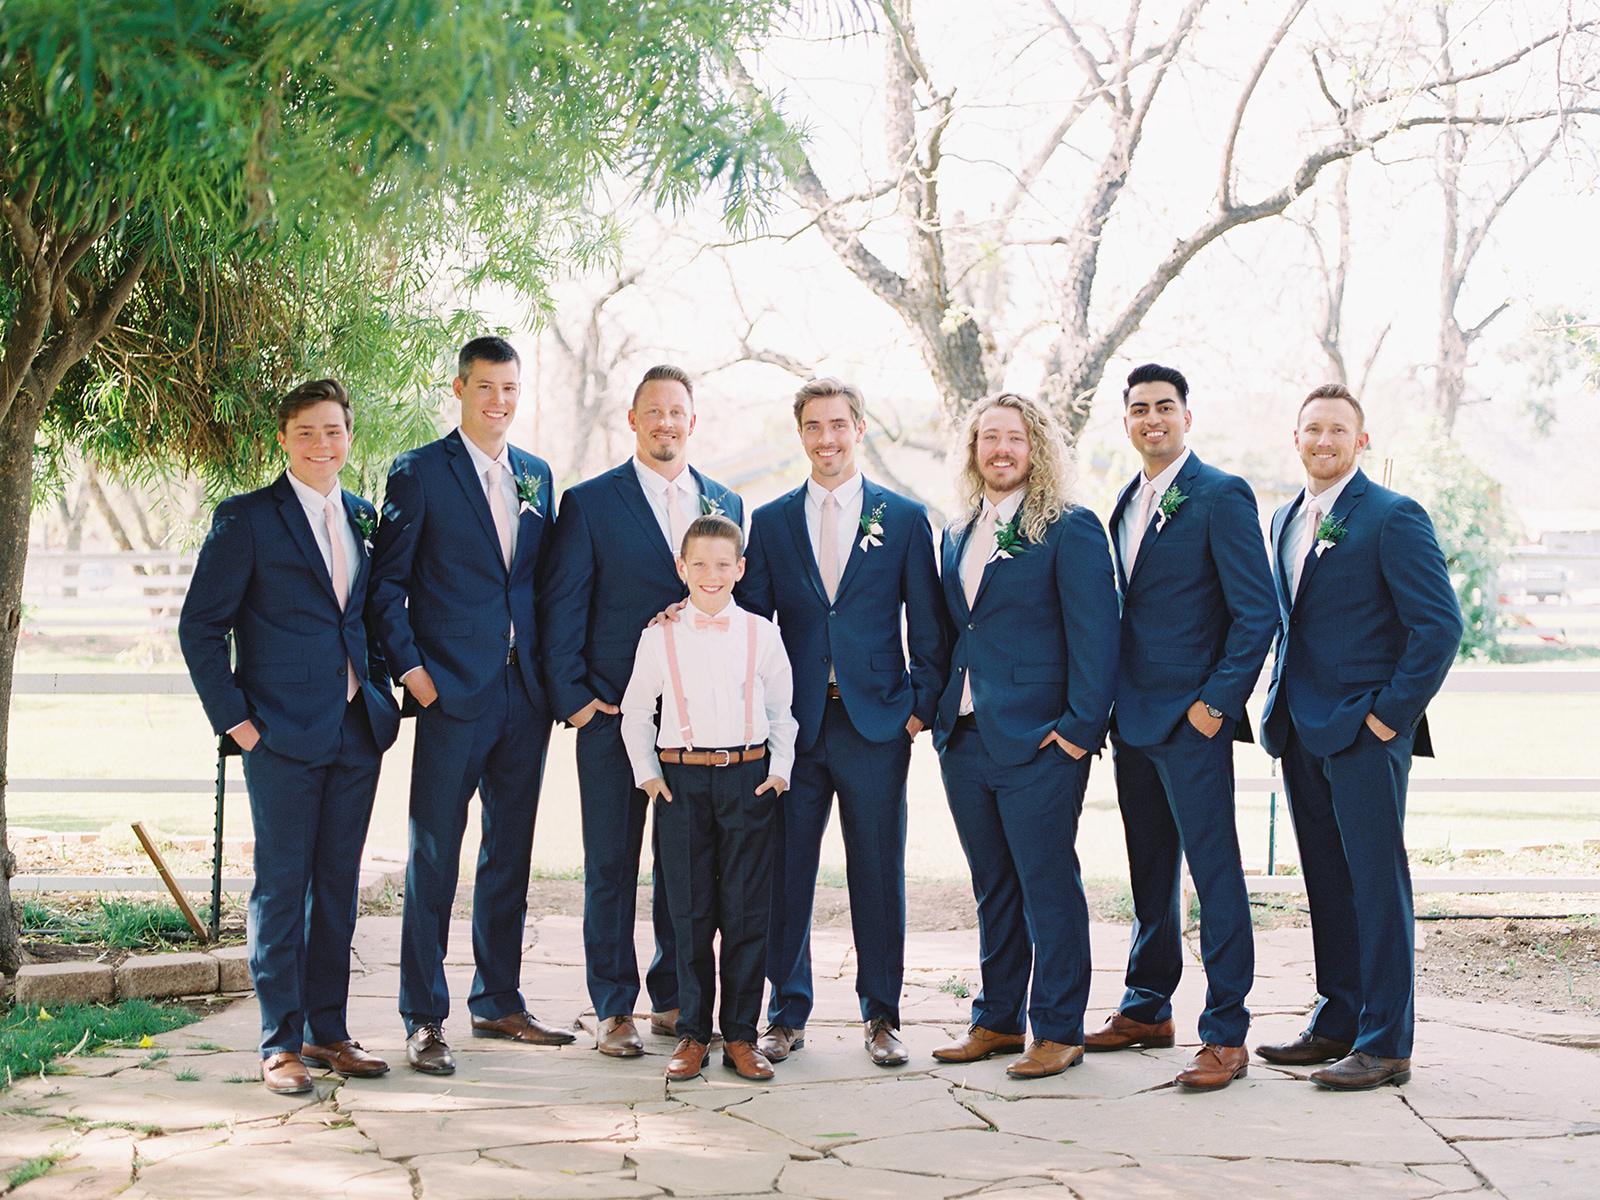 Lukas Wedding Party - Ball Photo Co-10.jpg